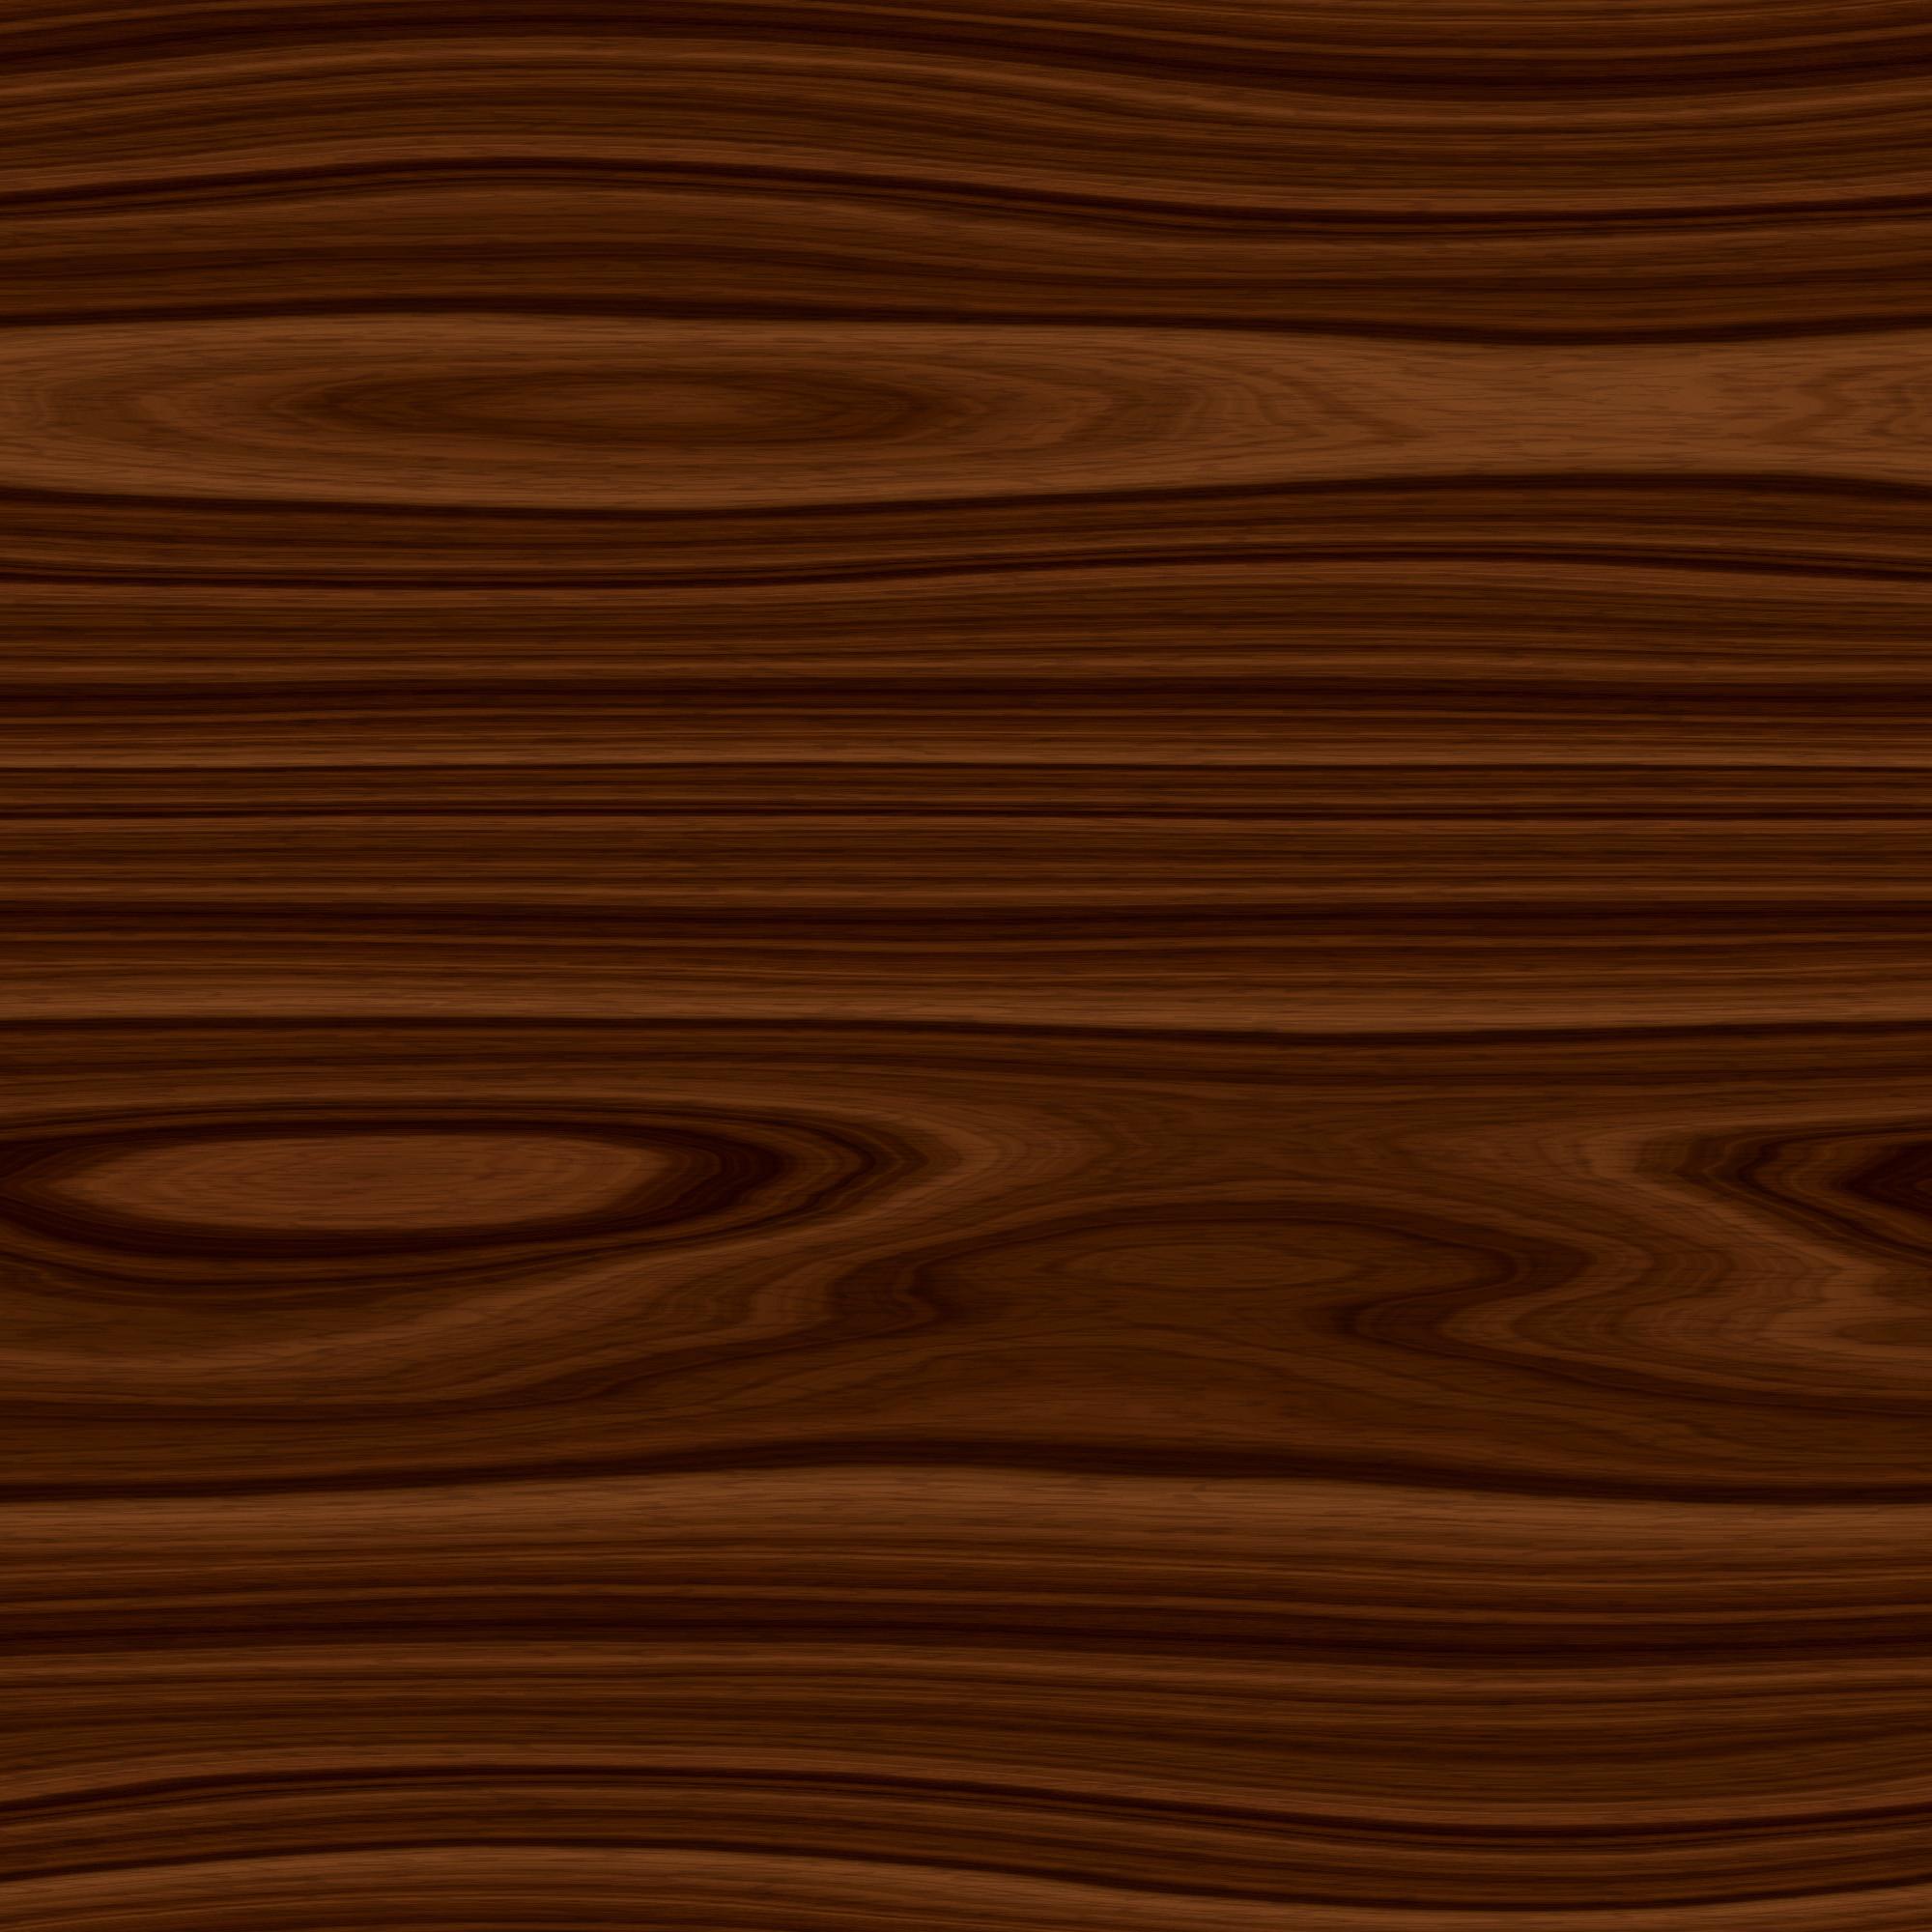 Desktop Wallpaper Wood Grain: Wood Grain Desktop Wallpaper (51+ Images